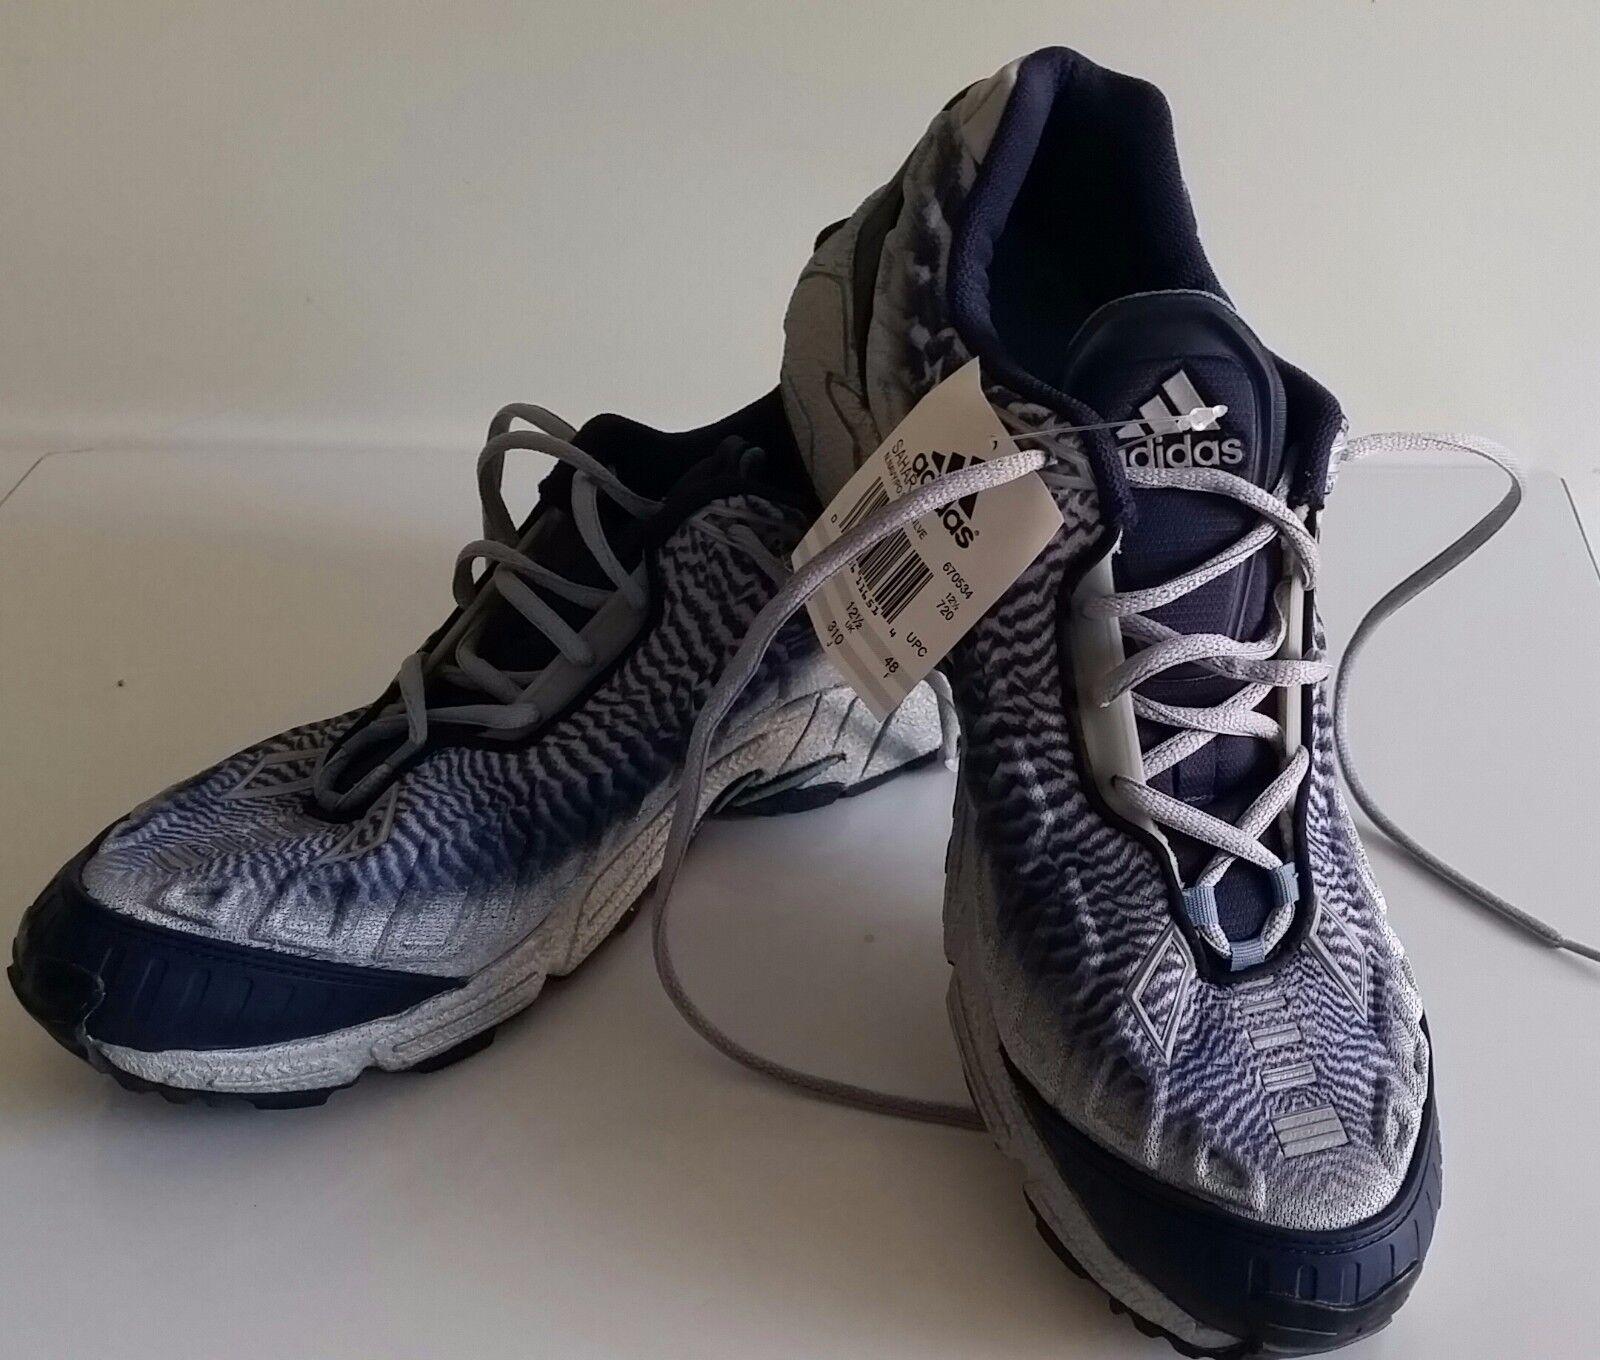 Pista atletica scarpe adidas - - uomo numero 13 - adidas 72089e